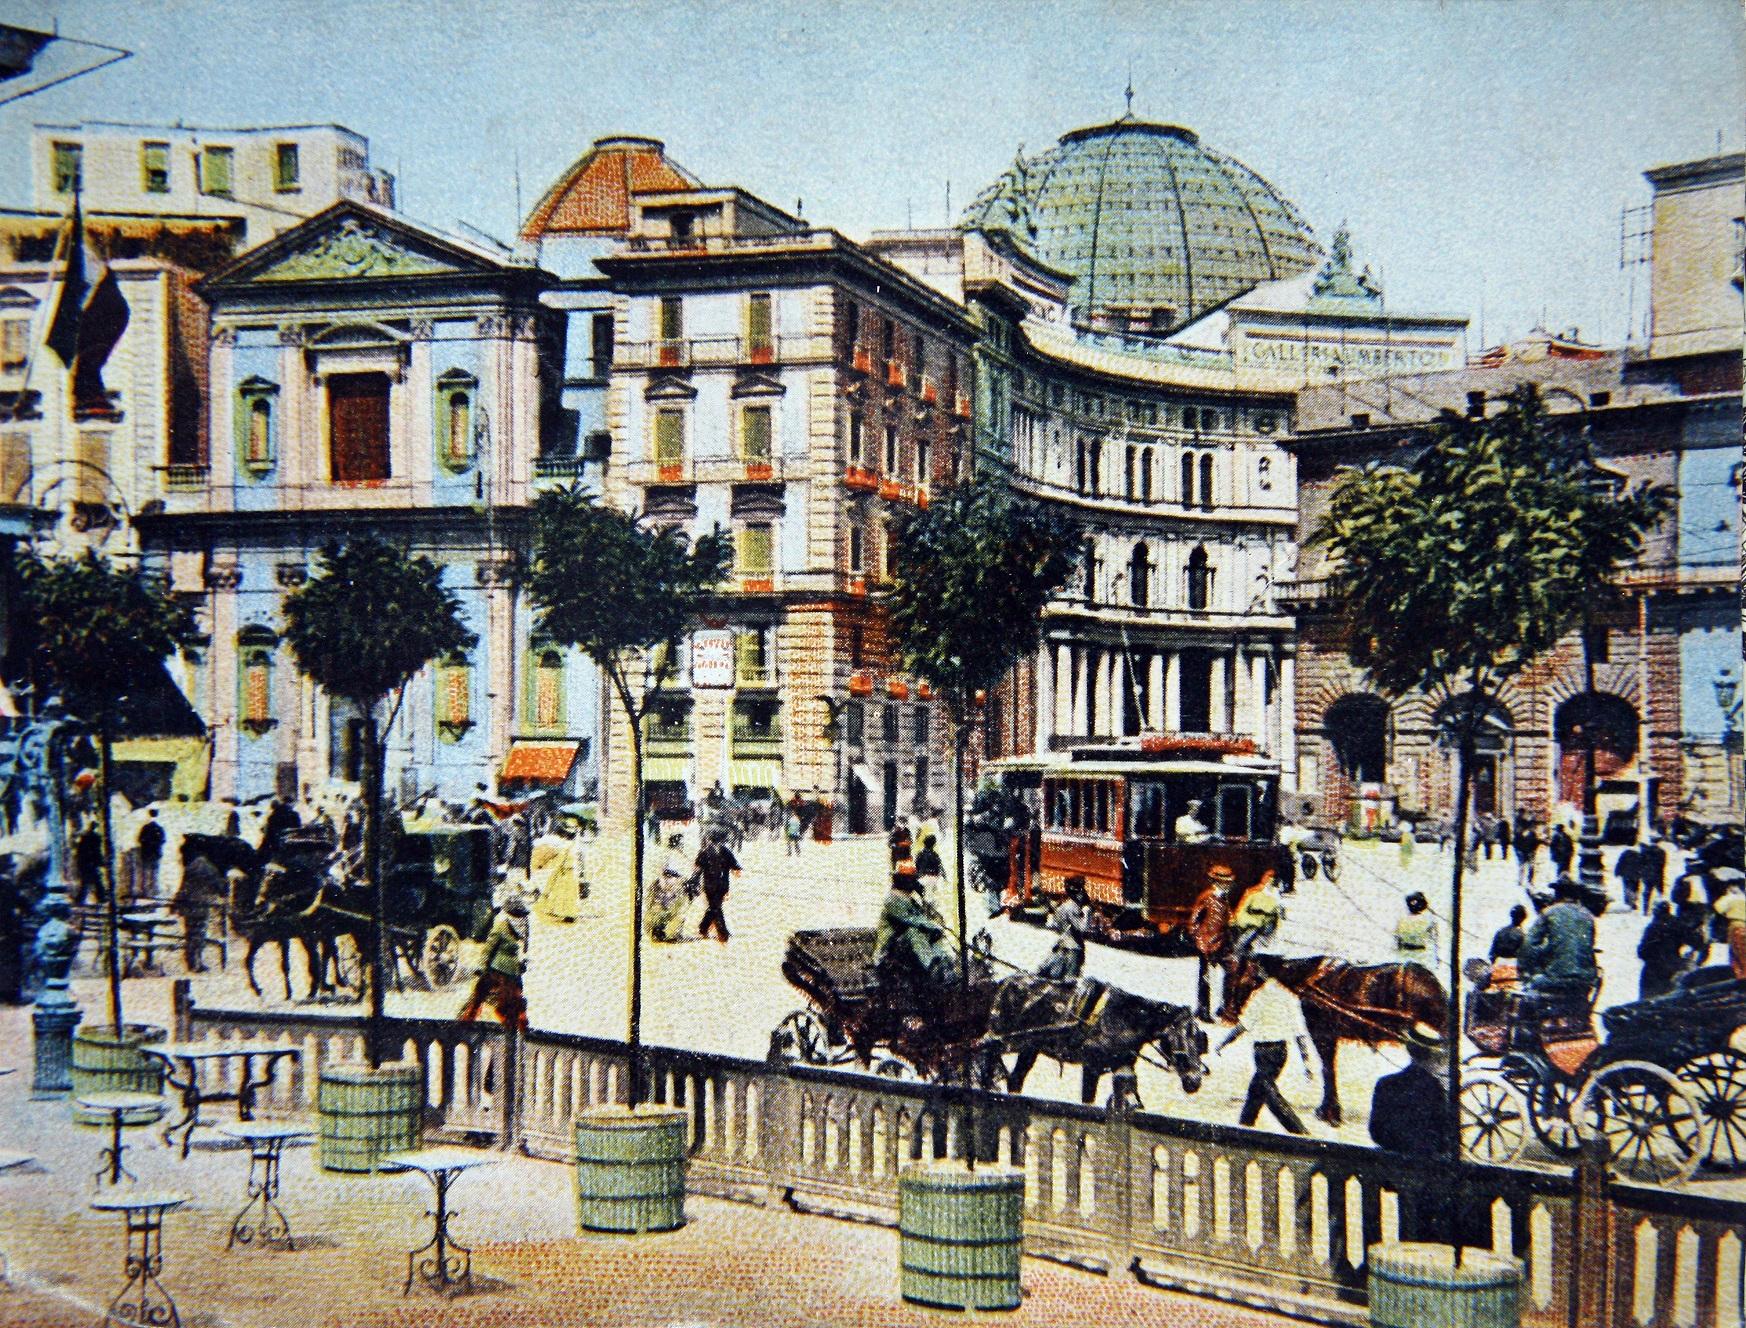 P.zza San Ferdinando